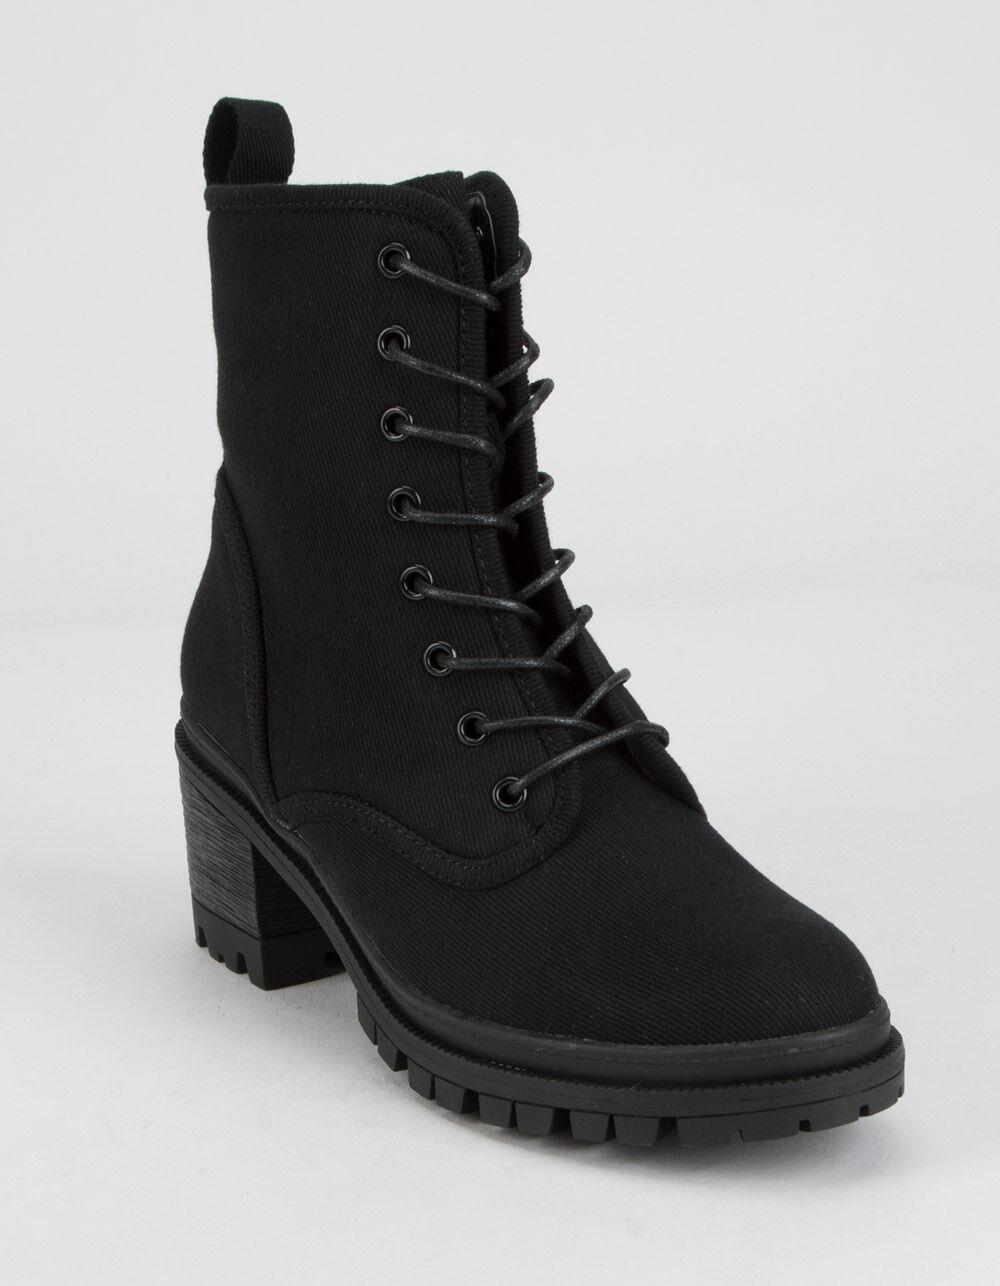 WILD DIVA Canvas Lace Up Lug Sole Black Boots